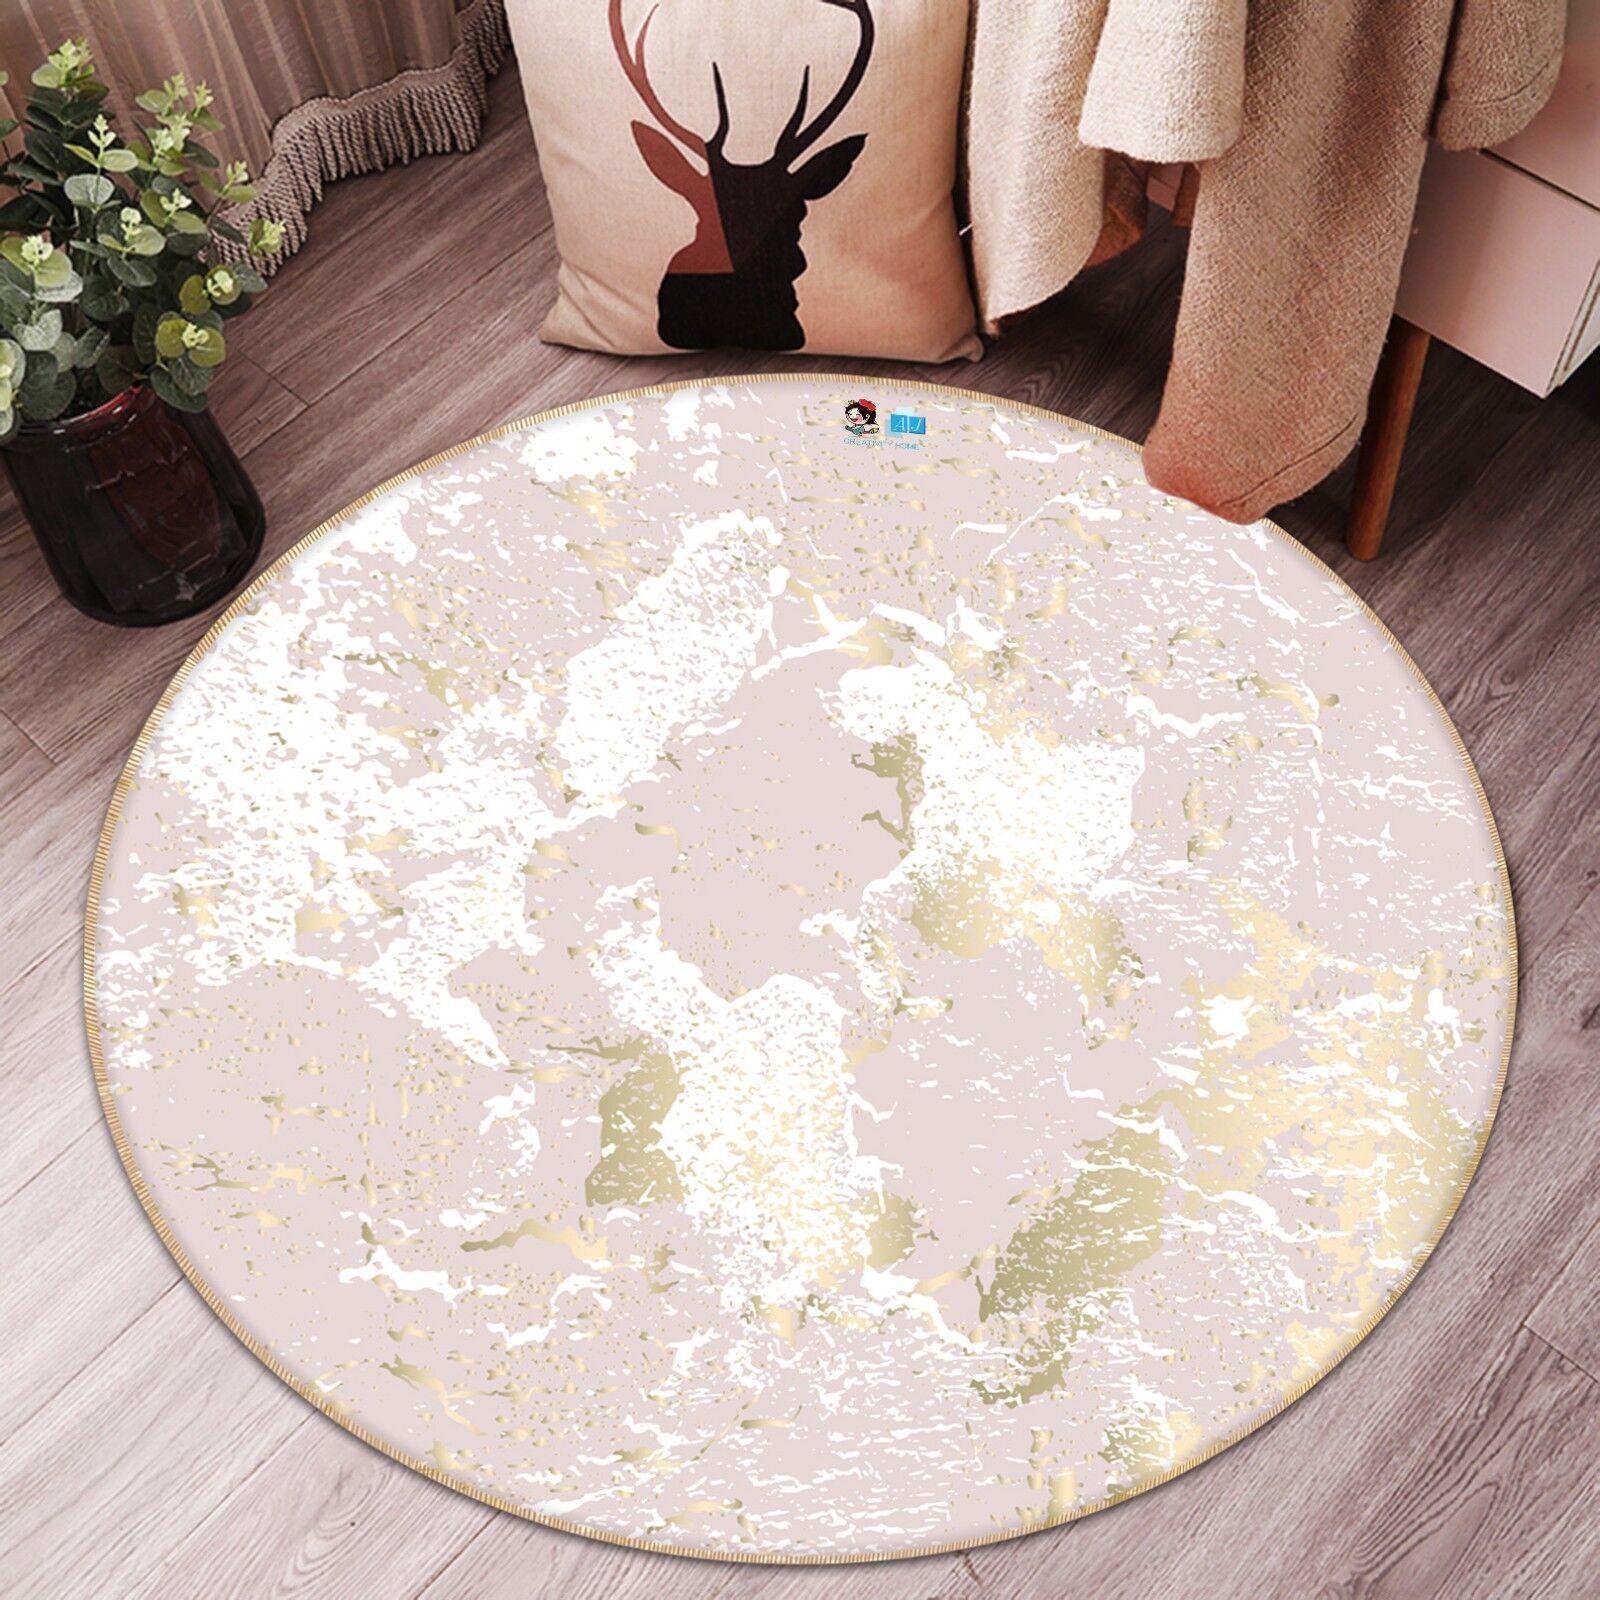 3D Mottled Retro Rosa 9 Non Non Non Slip Rug Room Mat Round Quality elegant photo carpet 5465bb